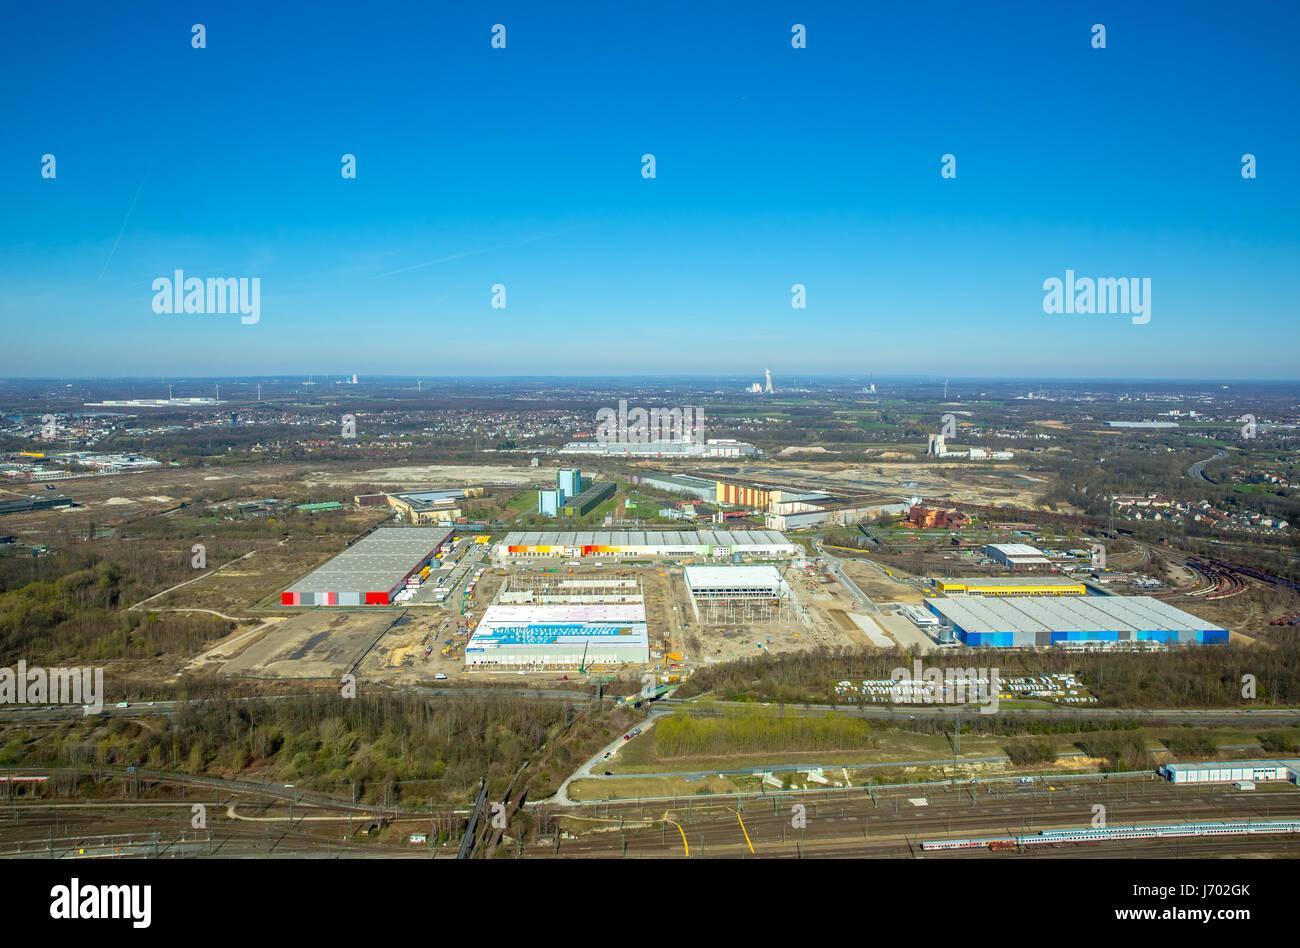 AMAZON Logistics Center Dortmund, next to Decathlon, Dortmund, Ruhr area, North Rhine-Westphalia, Germany,AMAZON - Stock Image